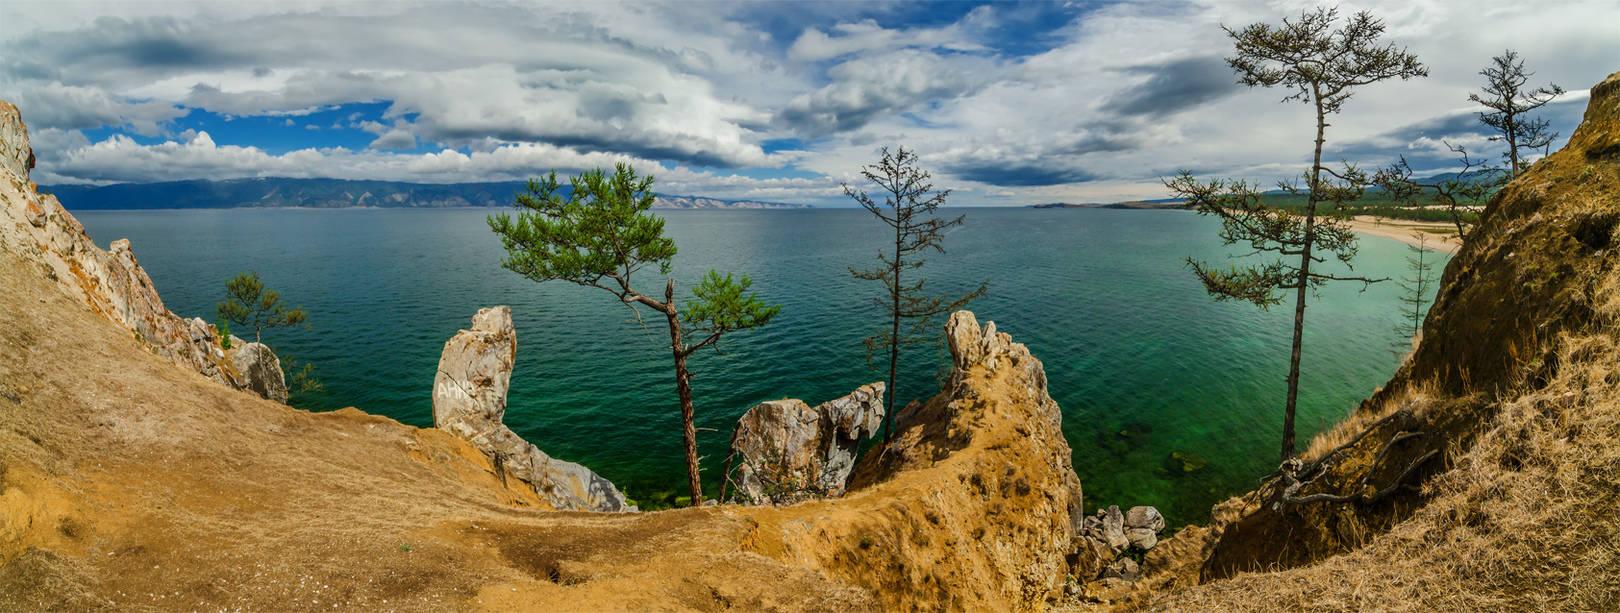 Панорамы Байкала